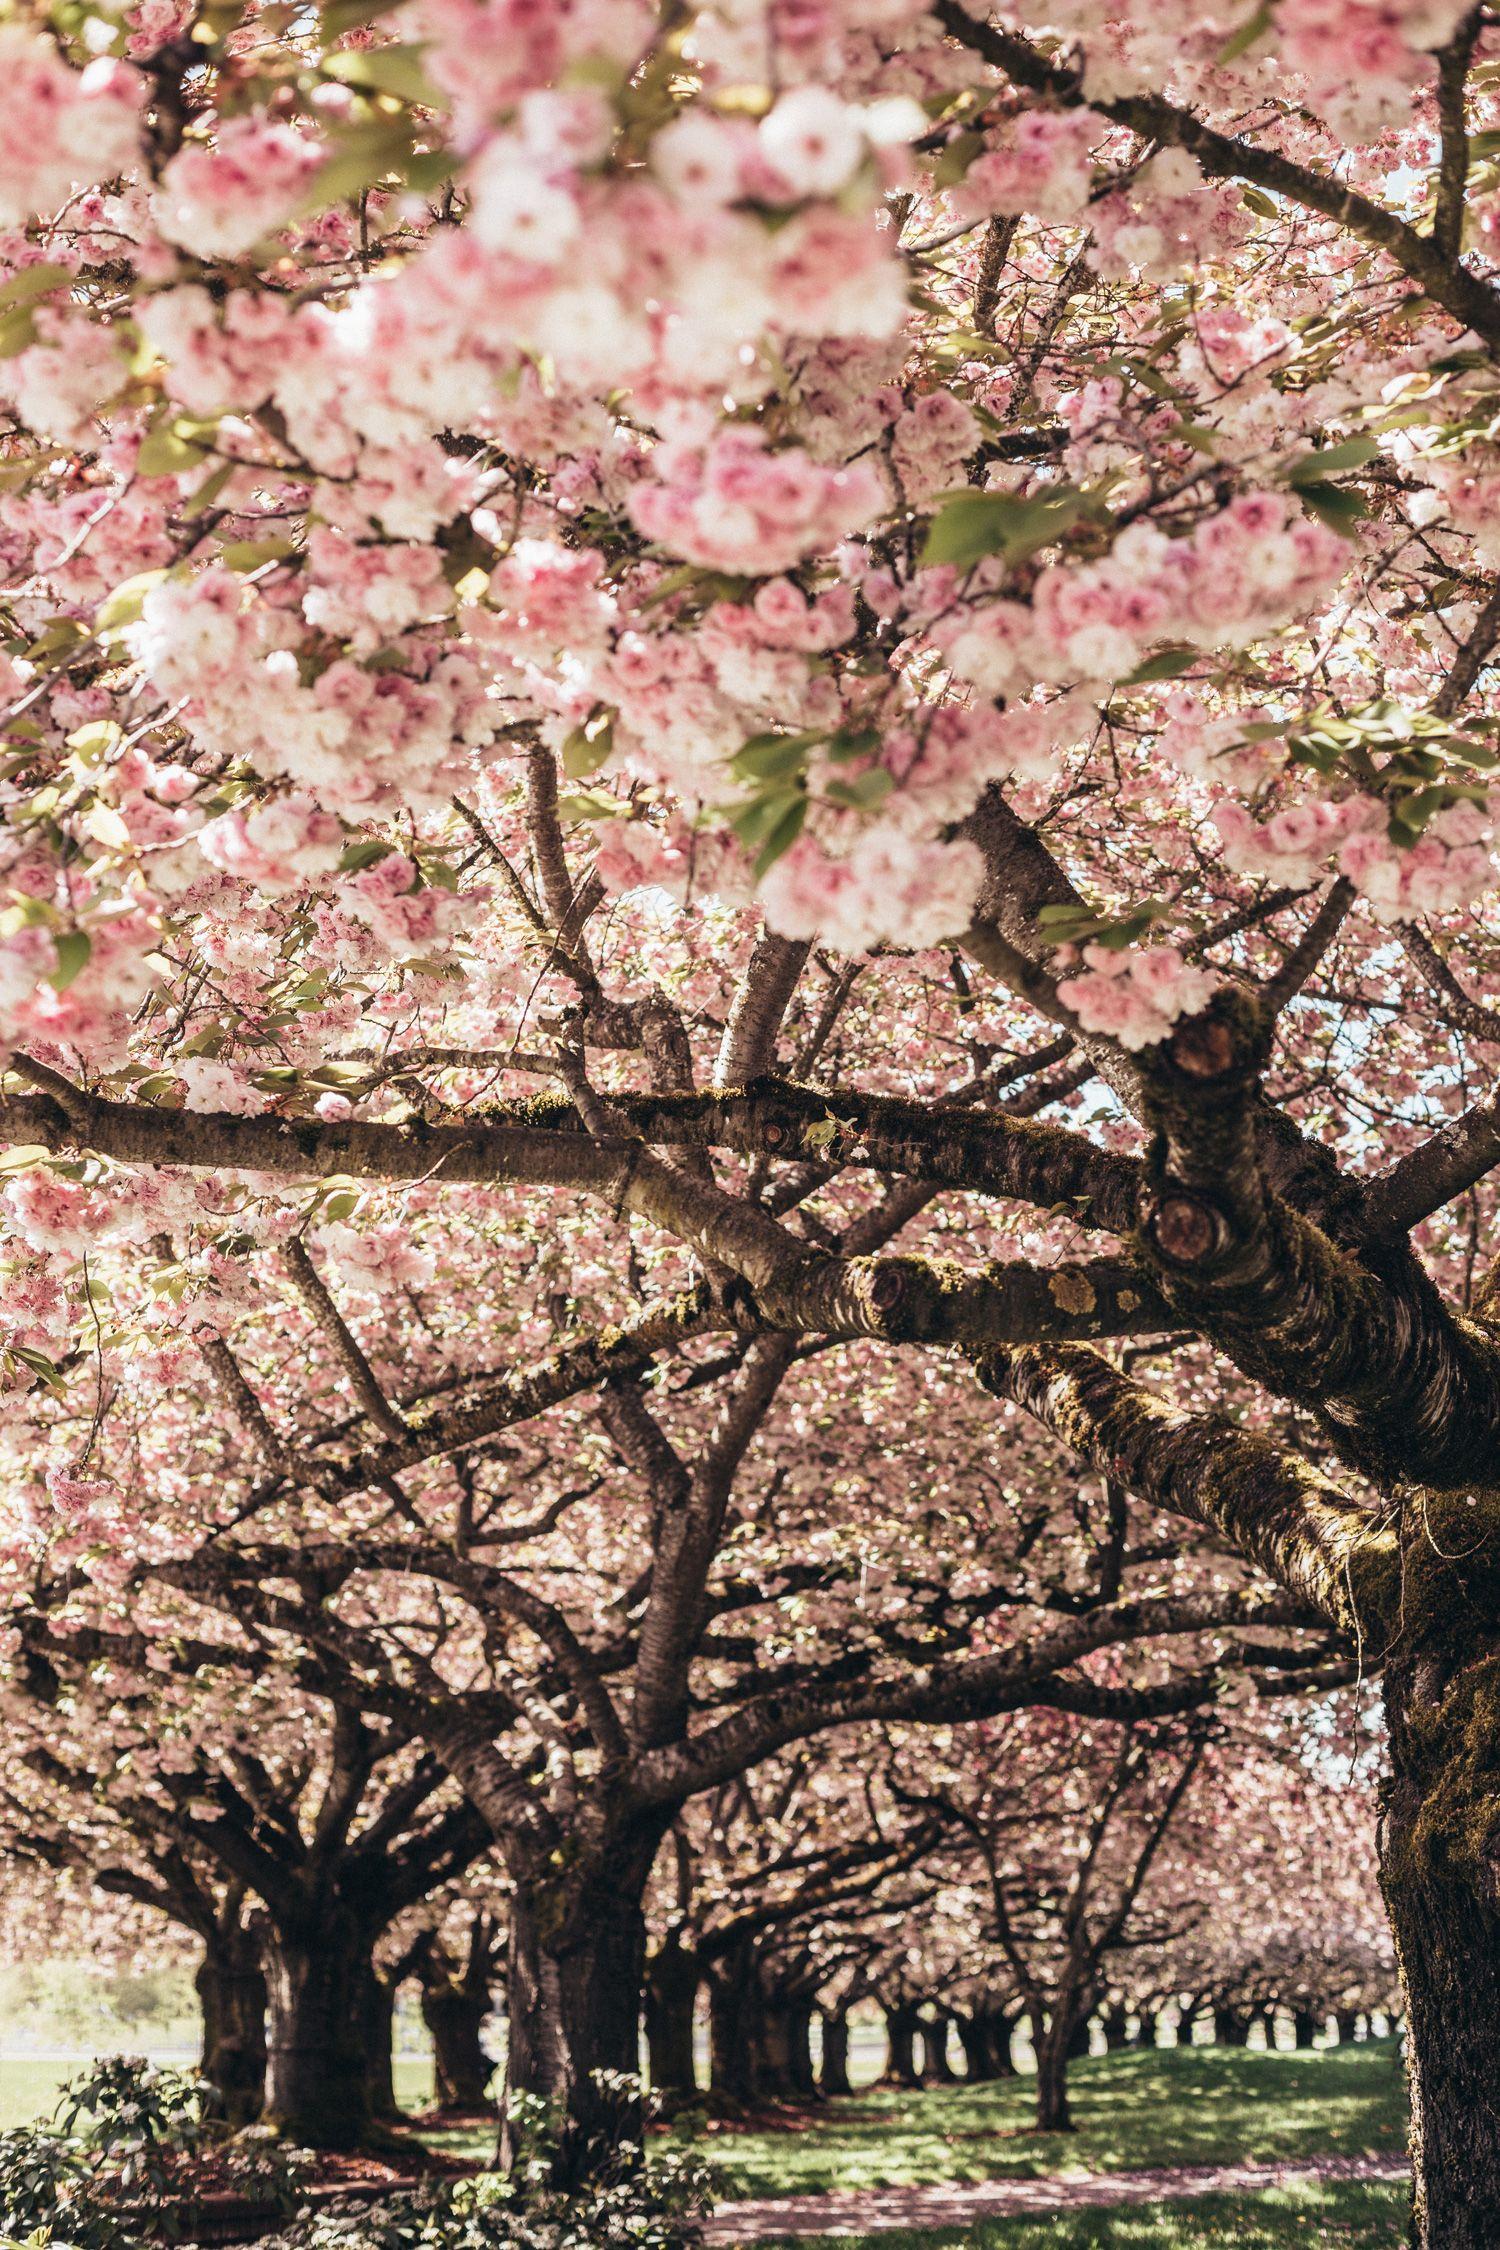 Shirofugen Cherry Blossom Trees Pastel Peach Outfit Blossom Trees Cherry Blossom Tree Cherry Blossom